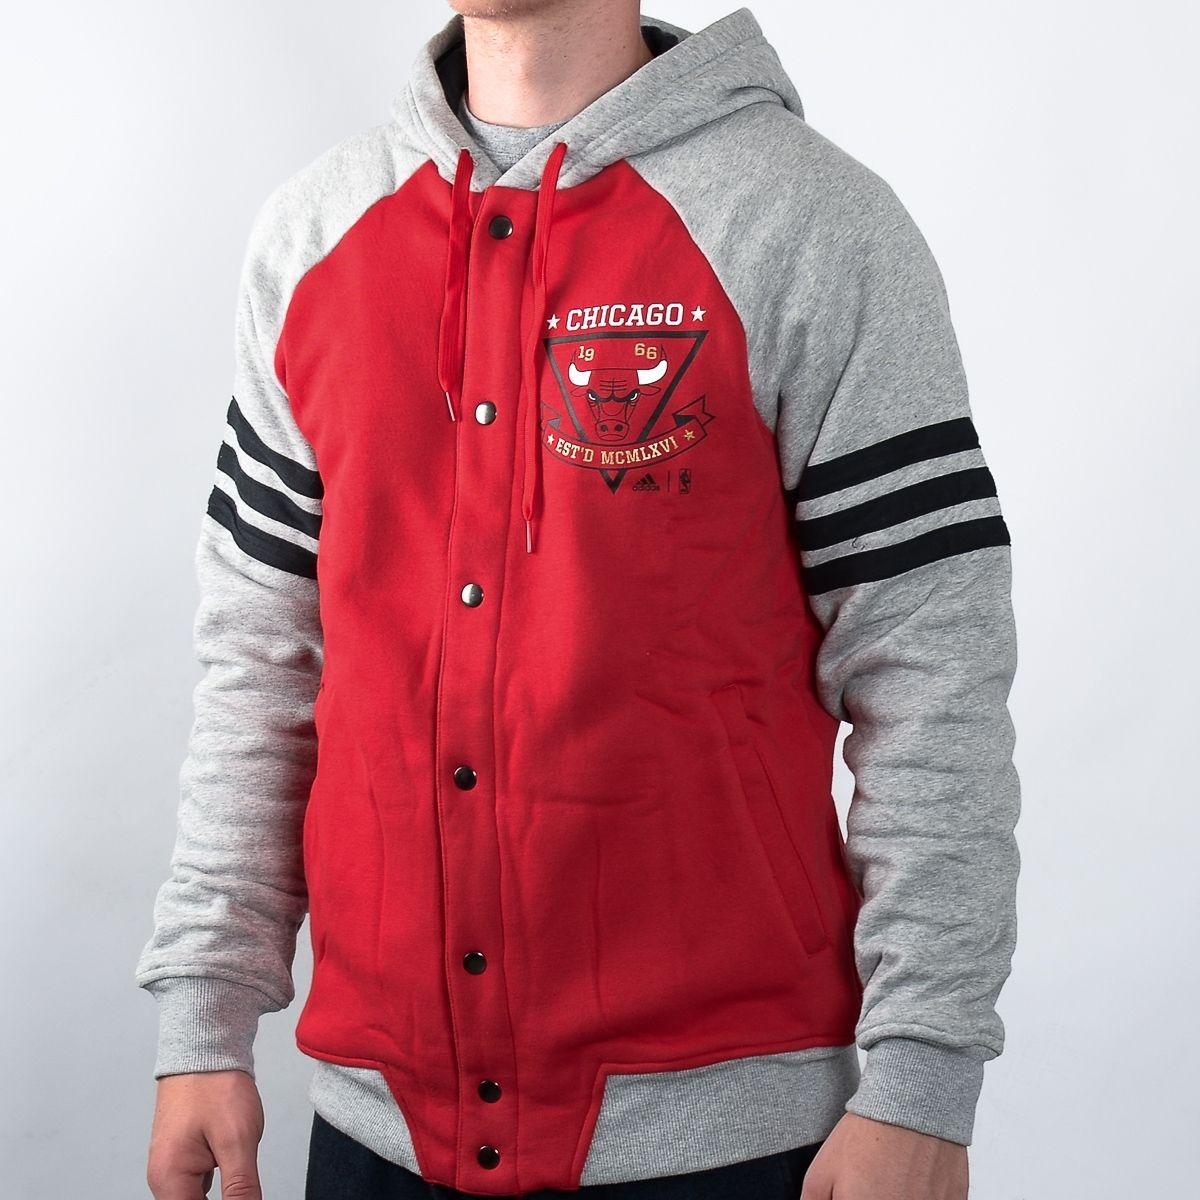 alquitrán experimental marxismo  Type Hoodies adidas NBA Chicago Bulls Washed Jacket